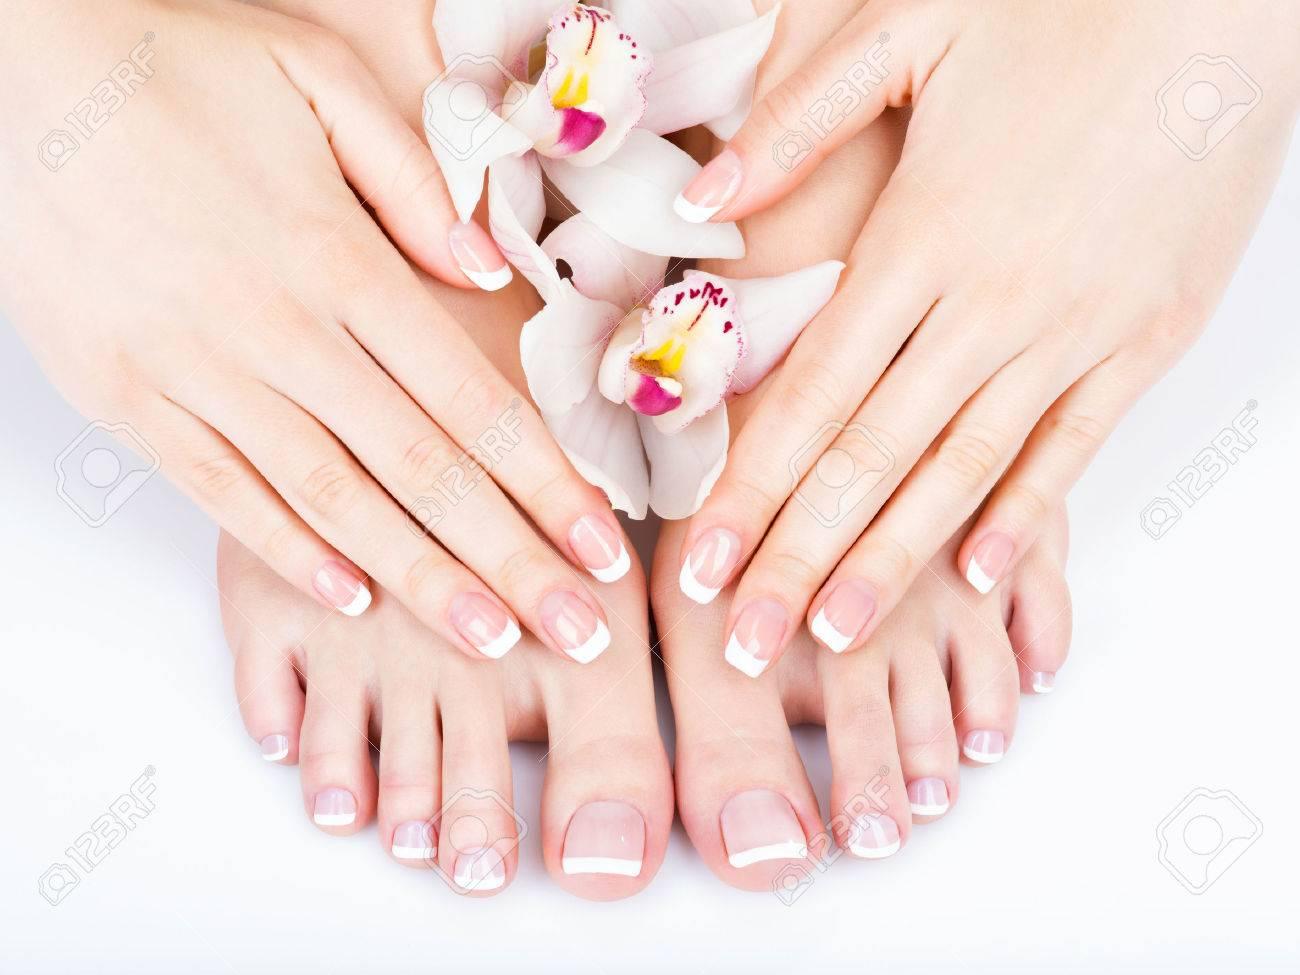 Closeup photo of a female feet at spa salon on pedicure and manicure procedure - Soft focus image - 54100907